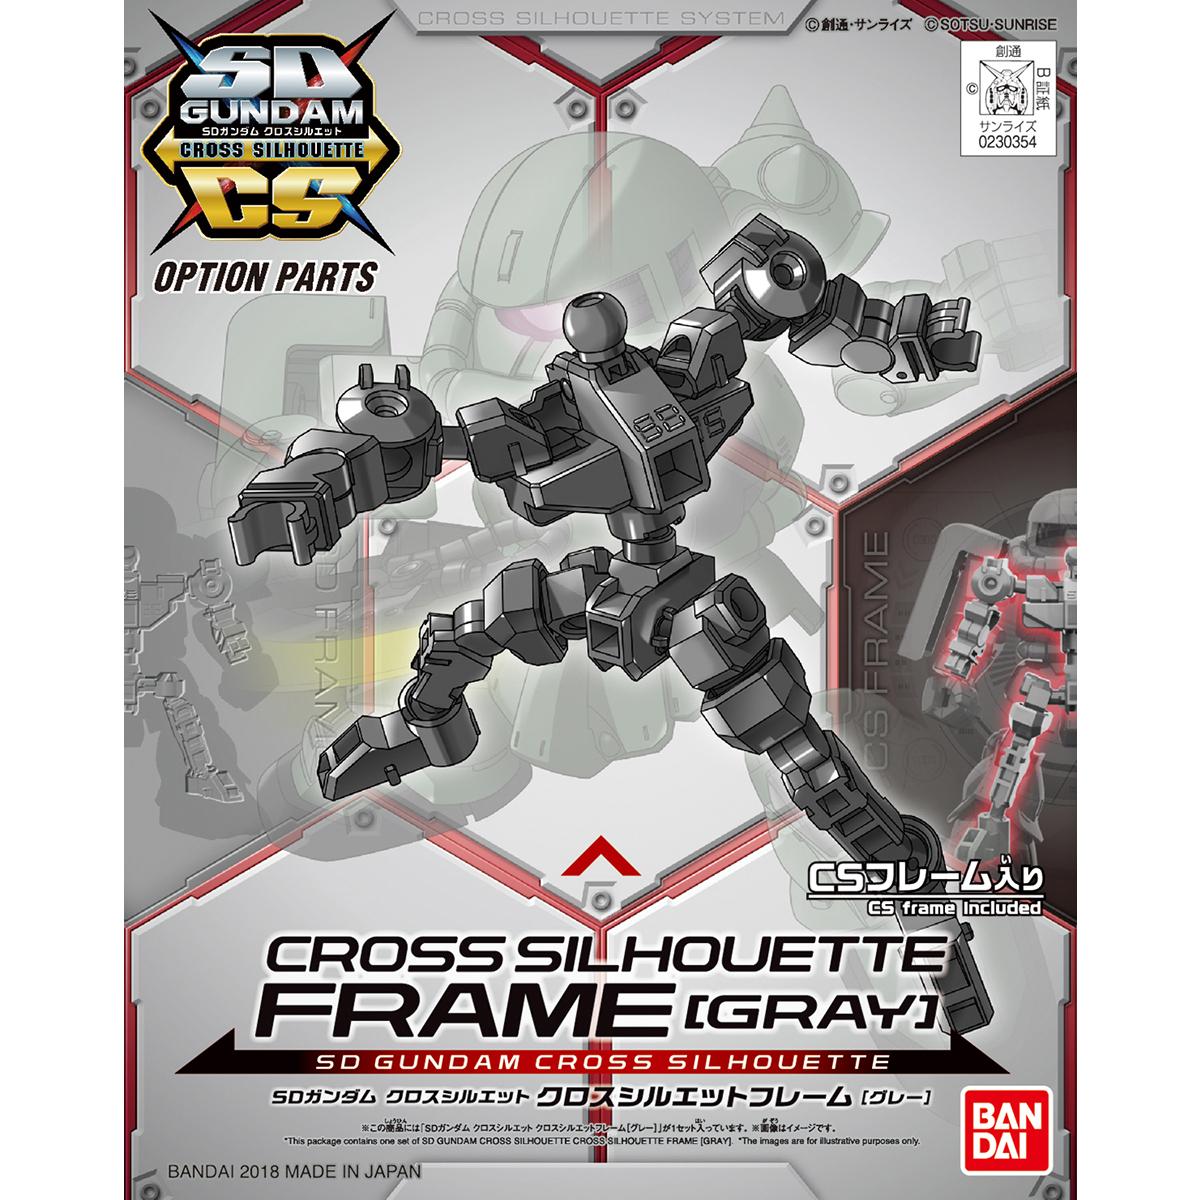 SD Gundam Cross Silhouette Cross Silhouette Frame [Gray]